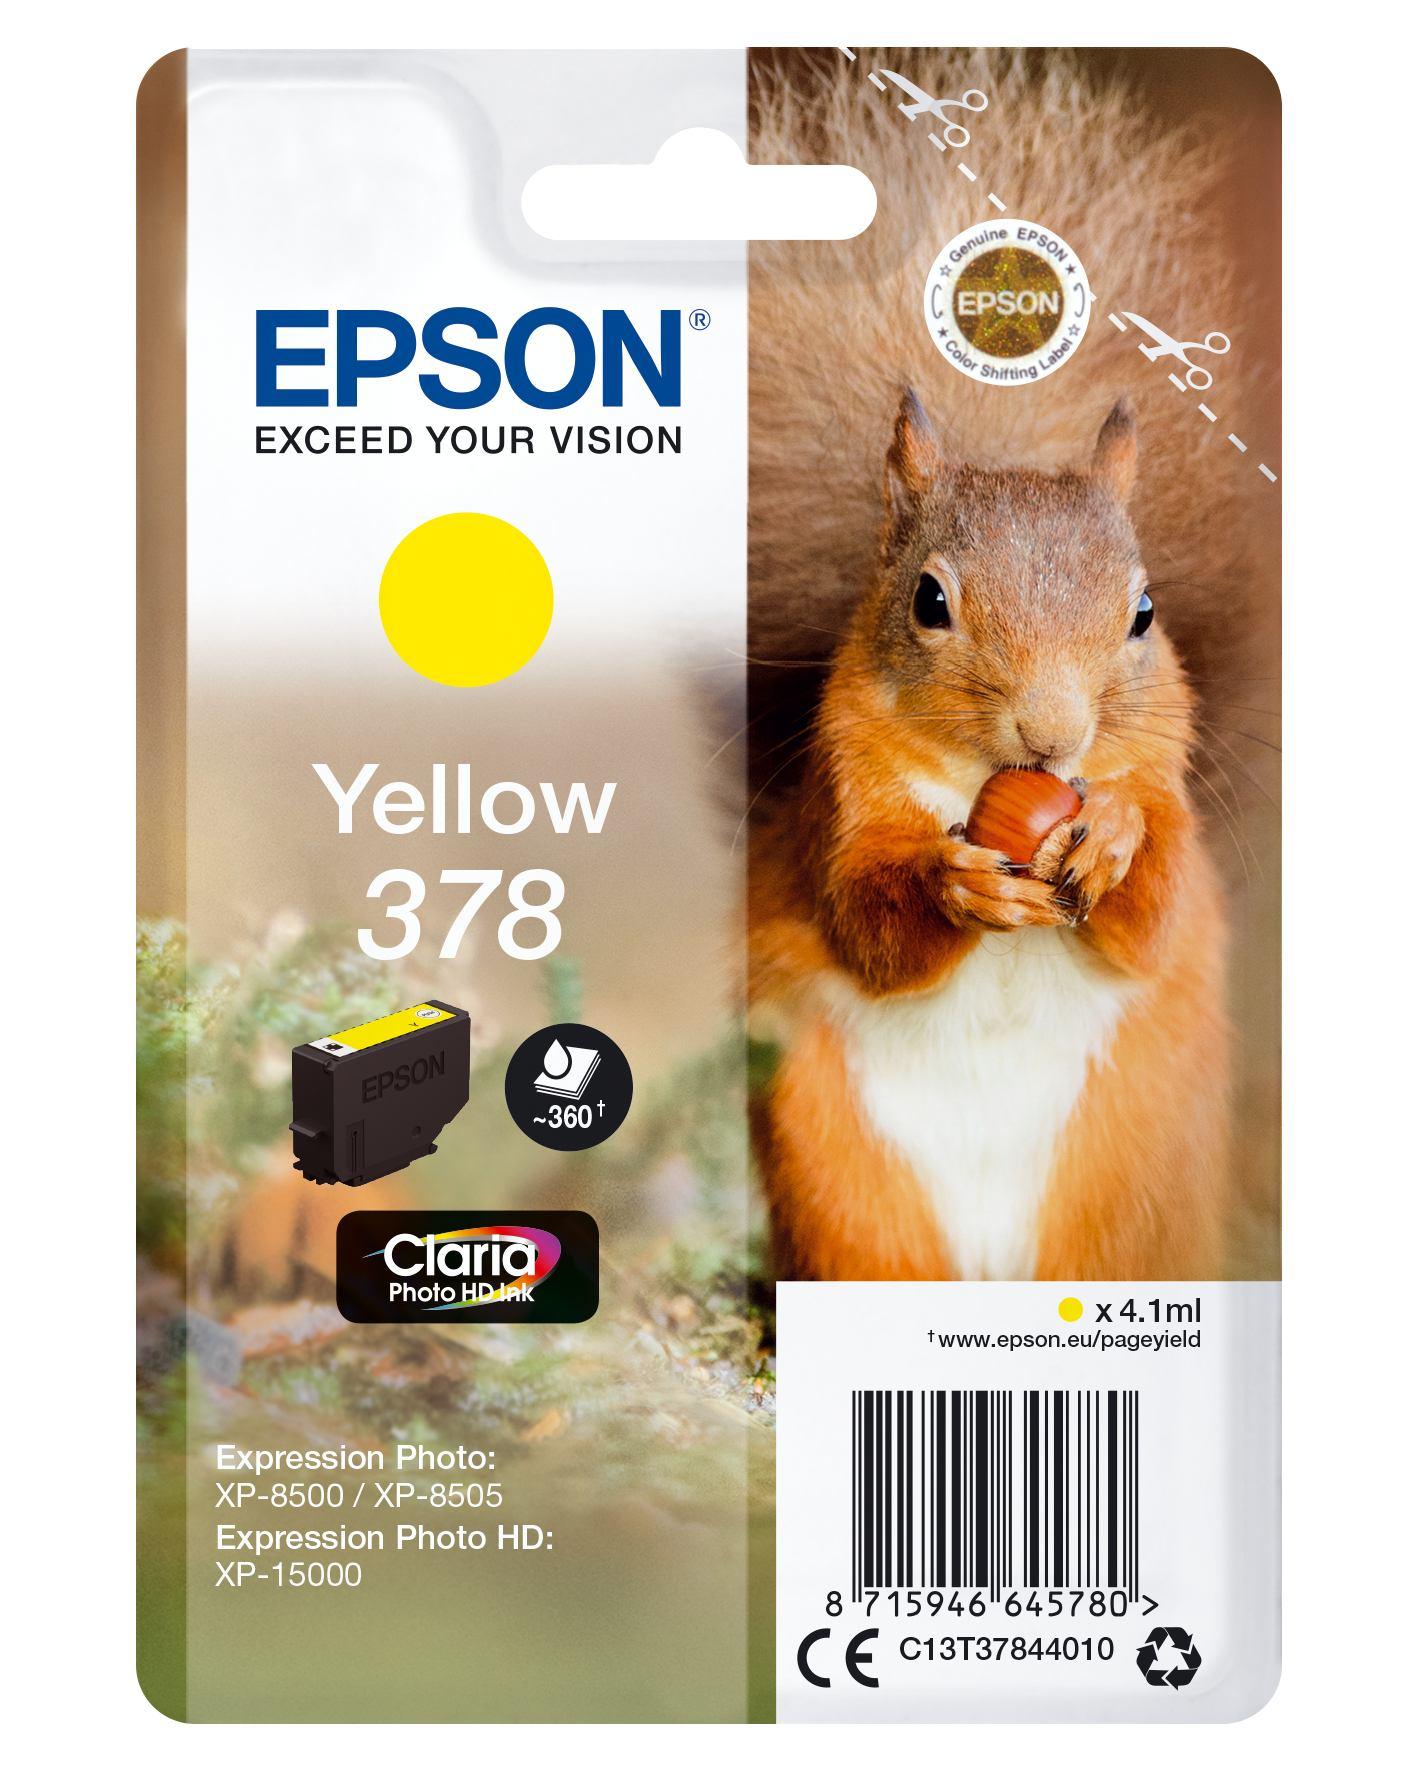 2465436-e-Squirrel-Singlepack-Yellow-378-Claria-Photo-HD-Ink-SINGLEPACK-YELLOW